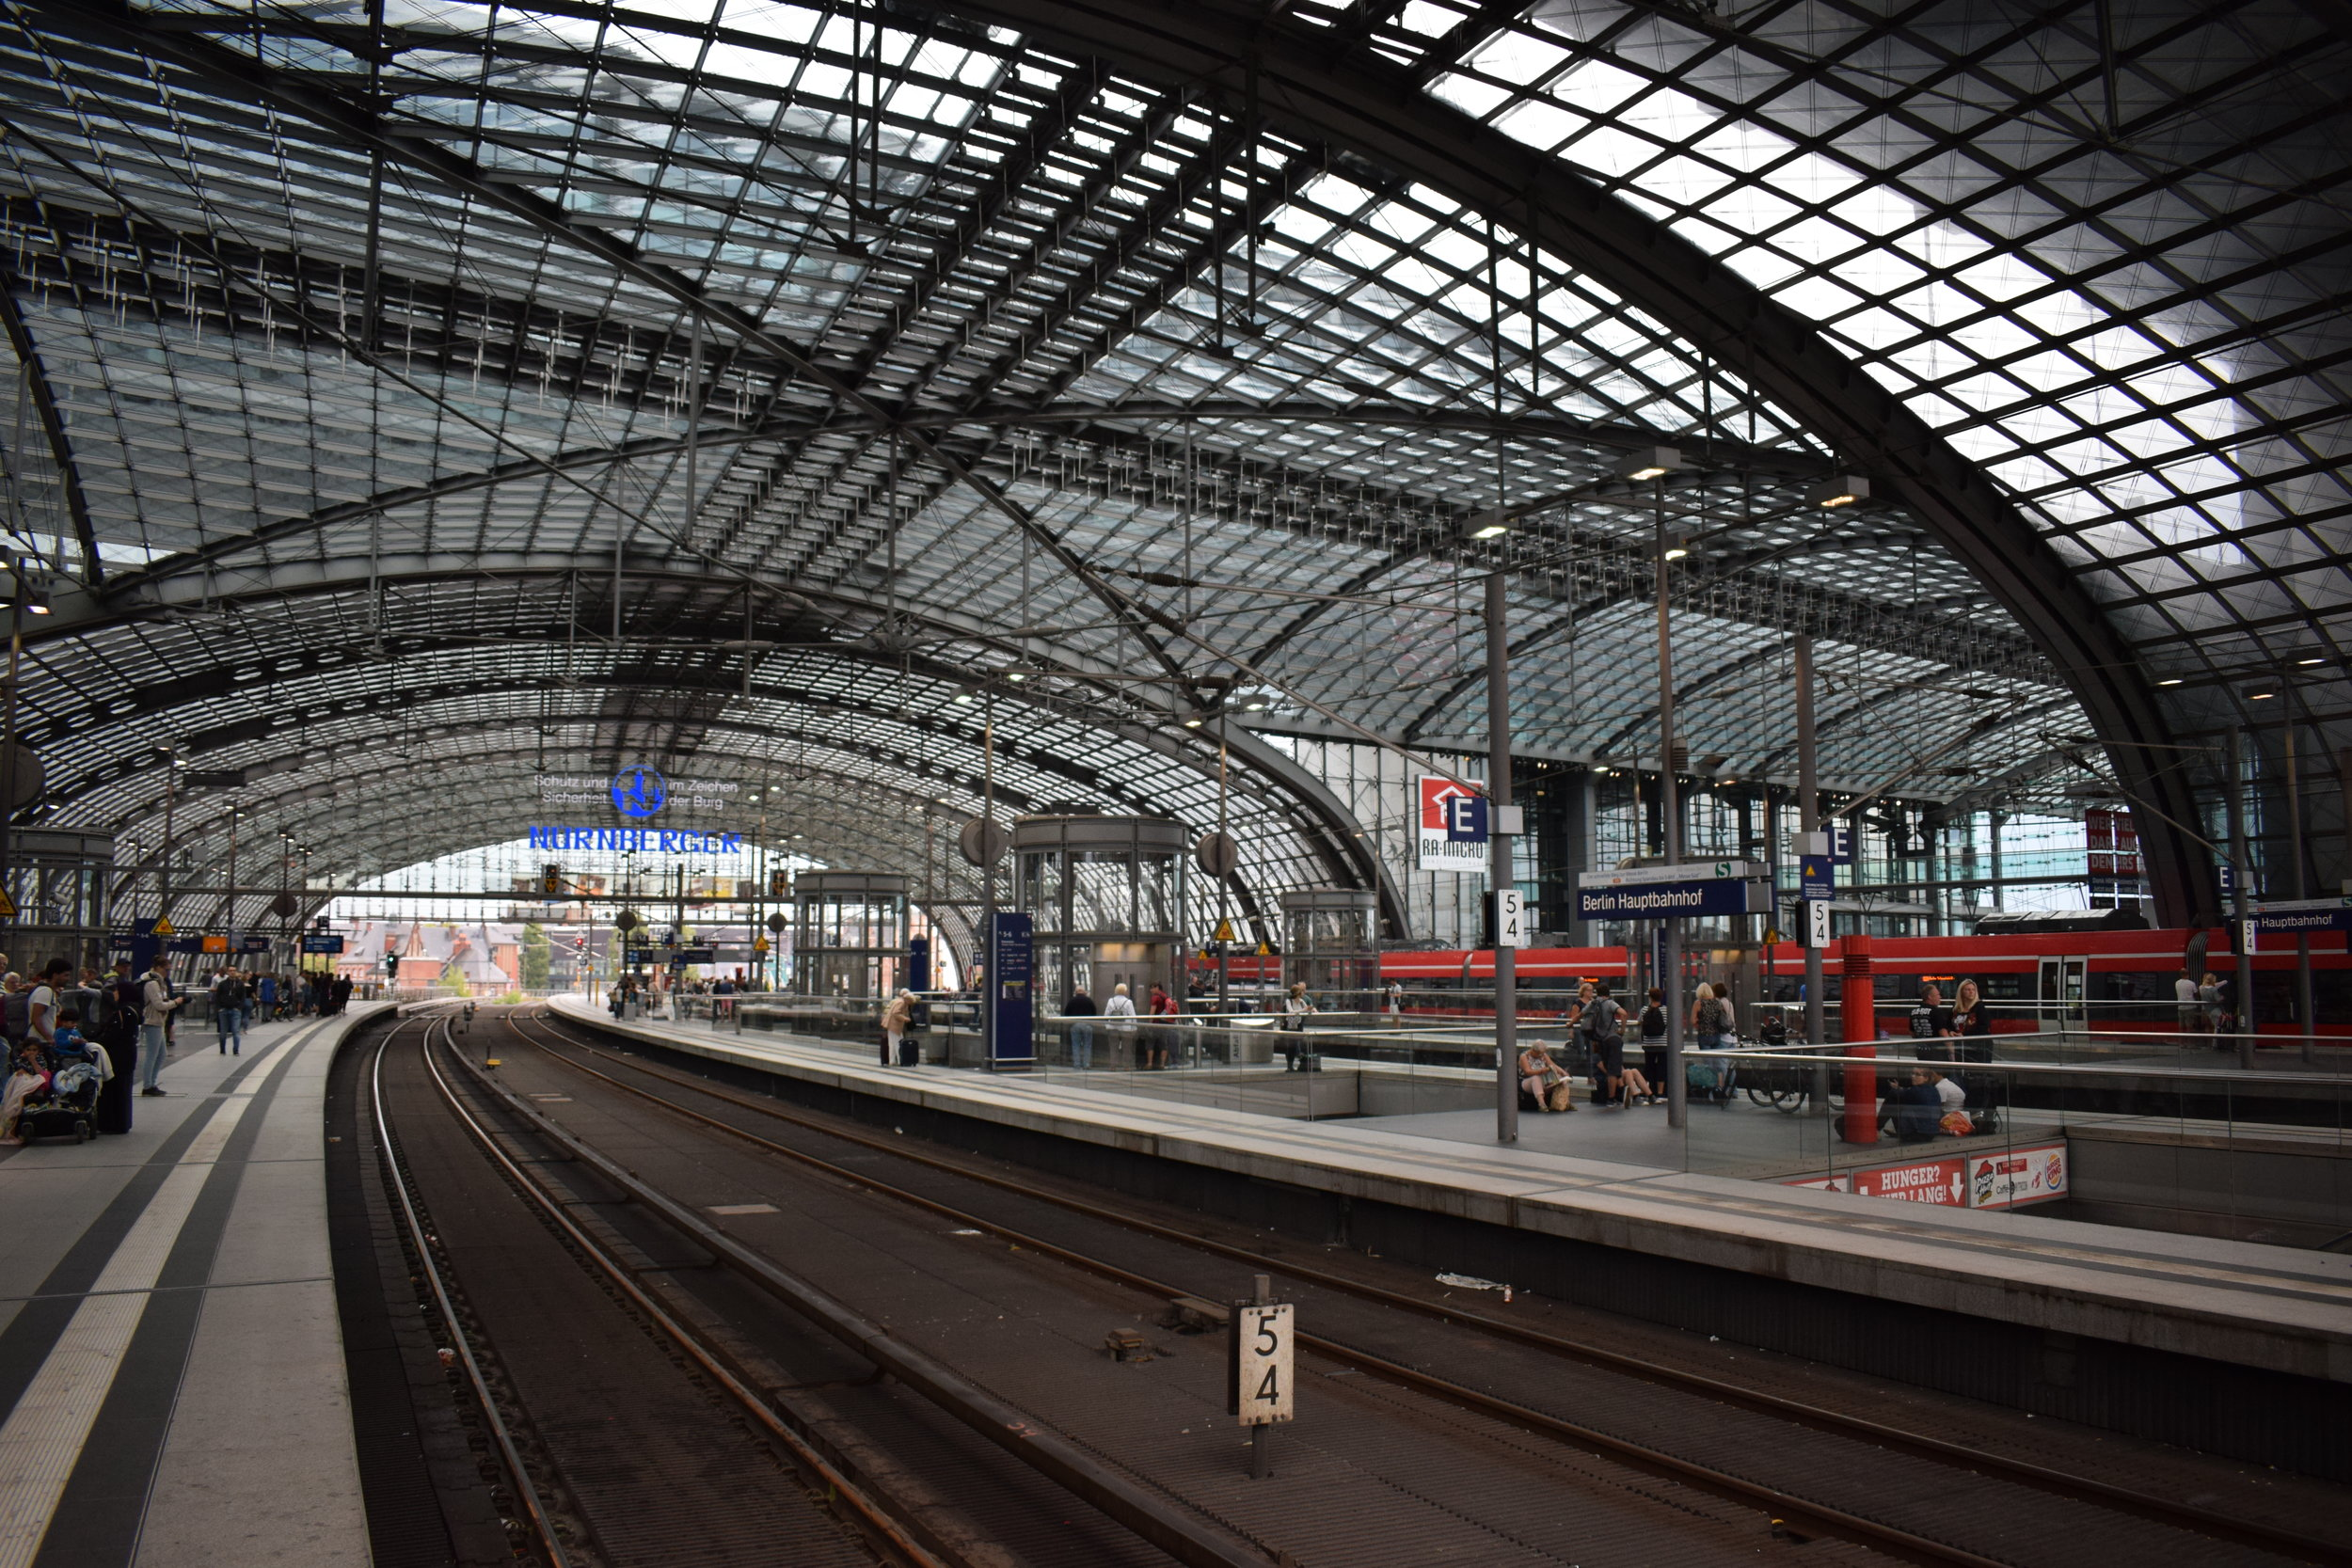 Waiting for the S-Bahn at Berlin Hauptbahnhof.